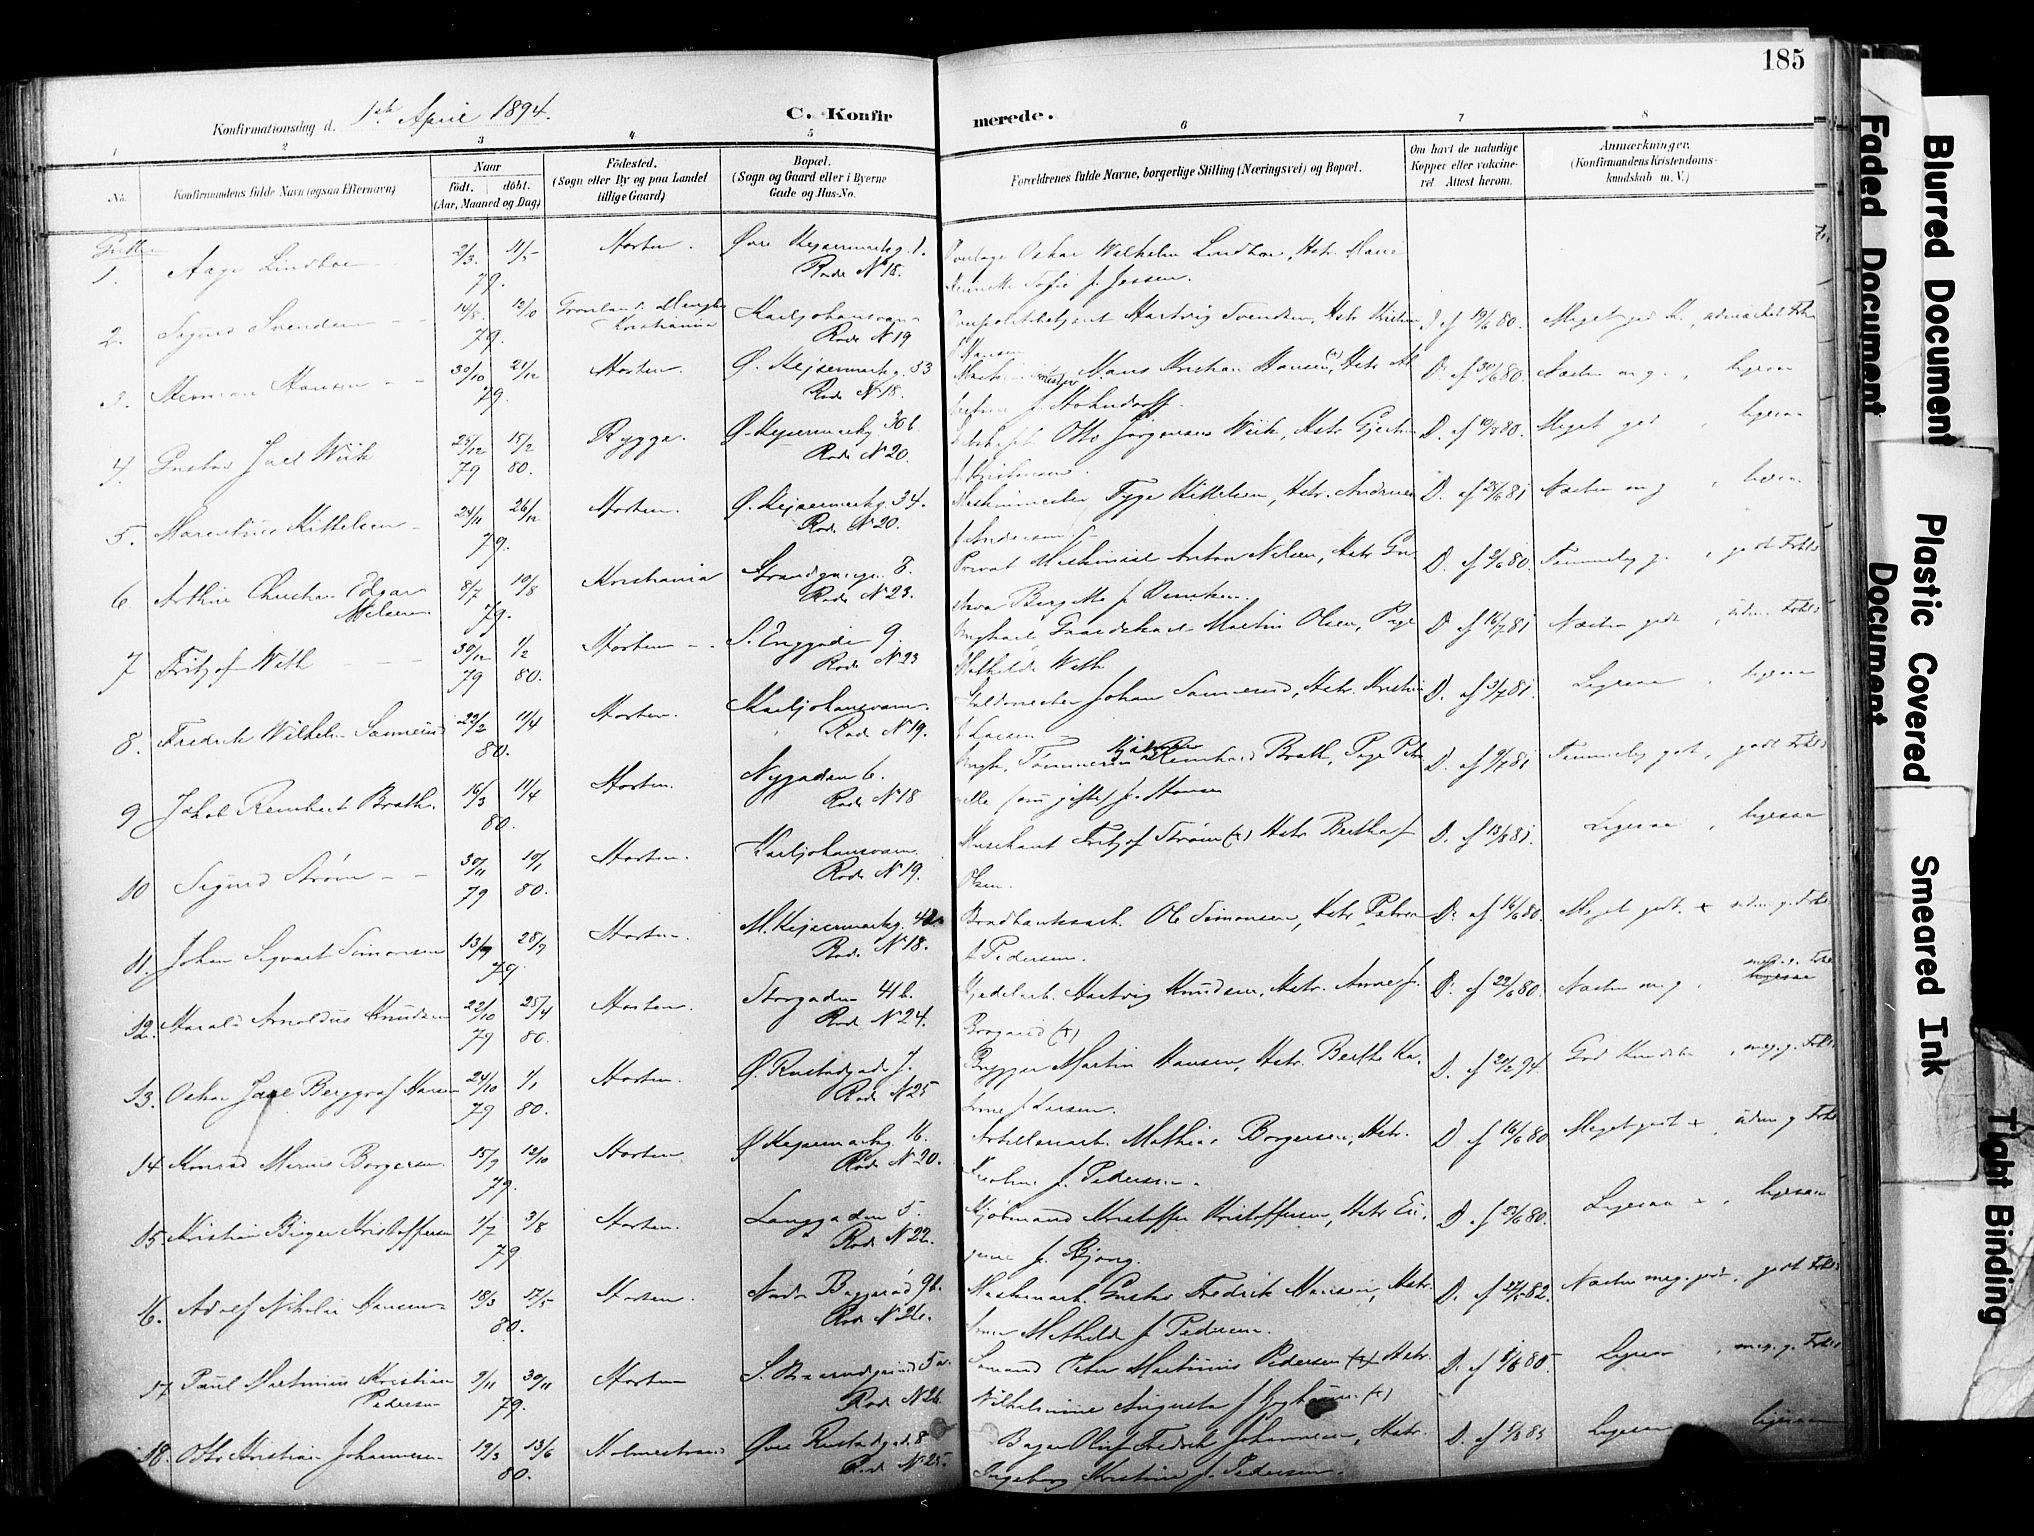 SAKO, Horten kirkebøker, F/Fa/L0004: Parish register (official) no. 4, 1888-1895, p. 185